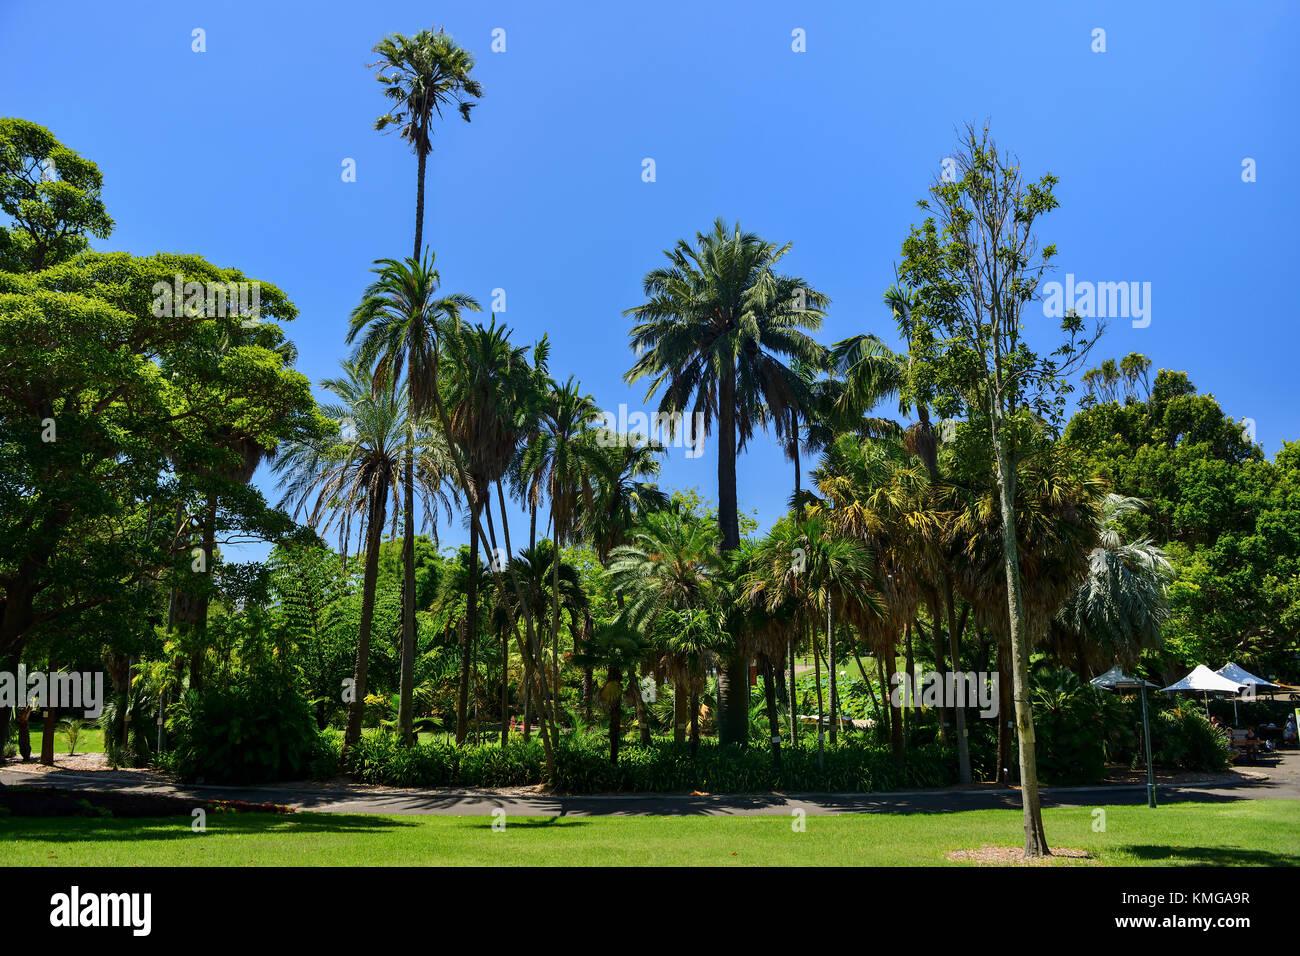 Palm trees in Royal Botanic Garden Sydney, New South Wales, Australia Stock Photo